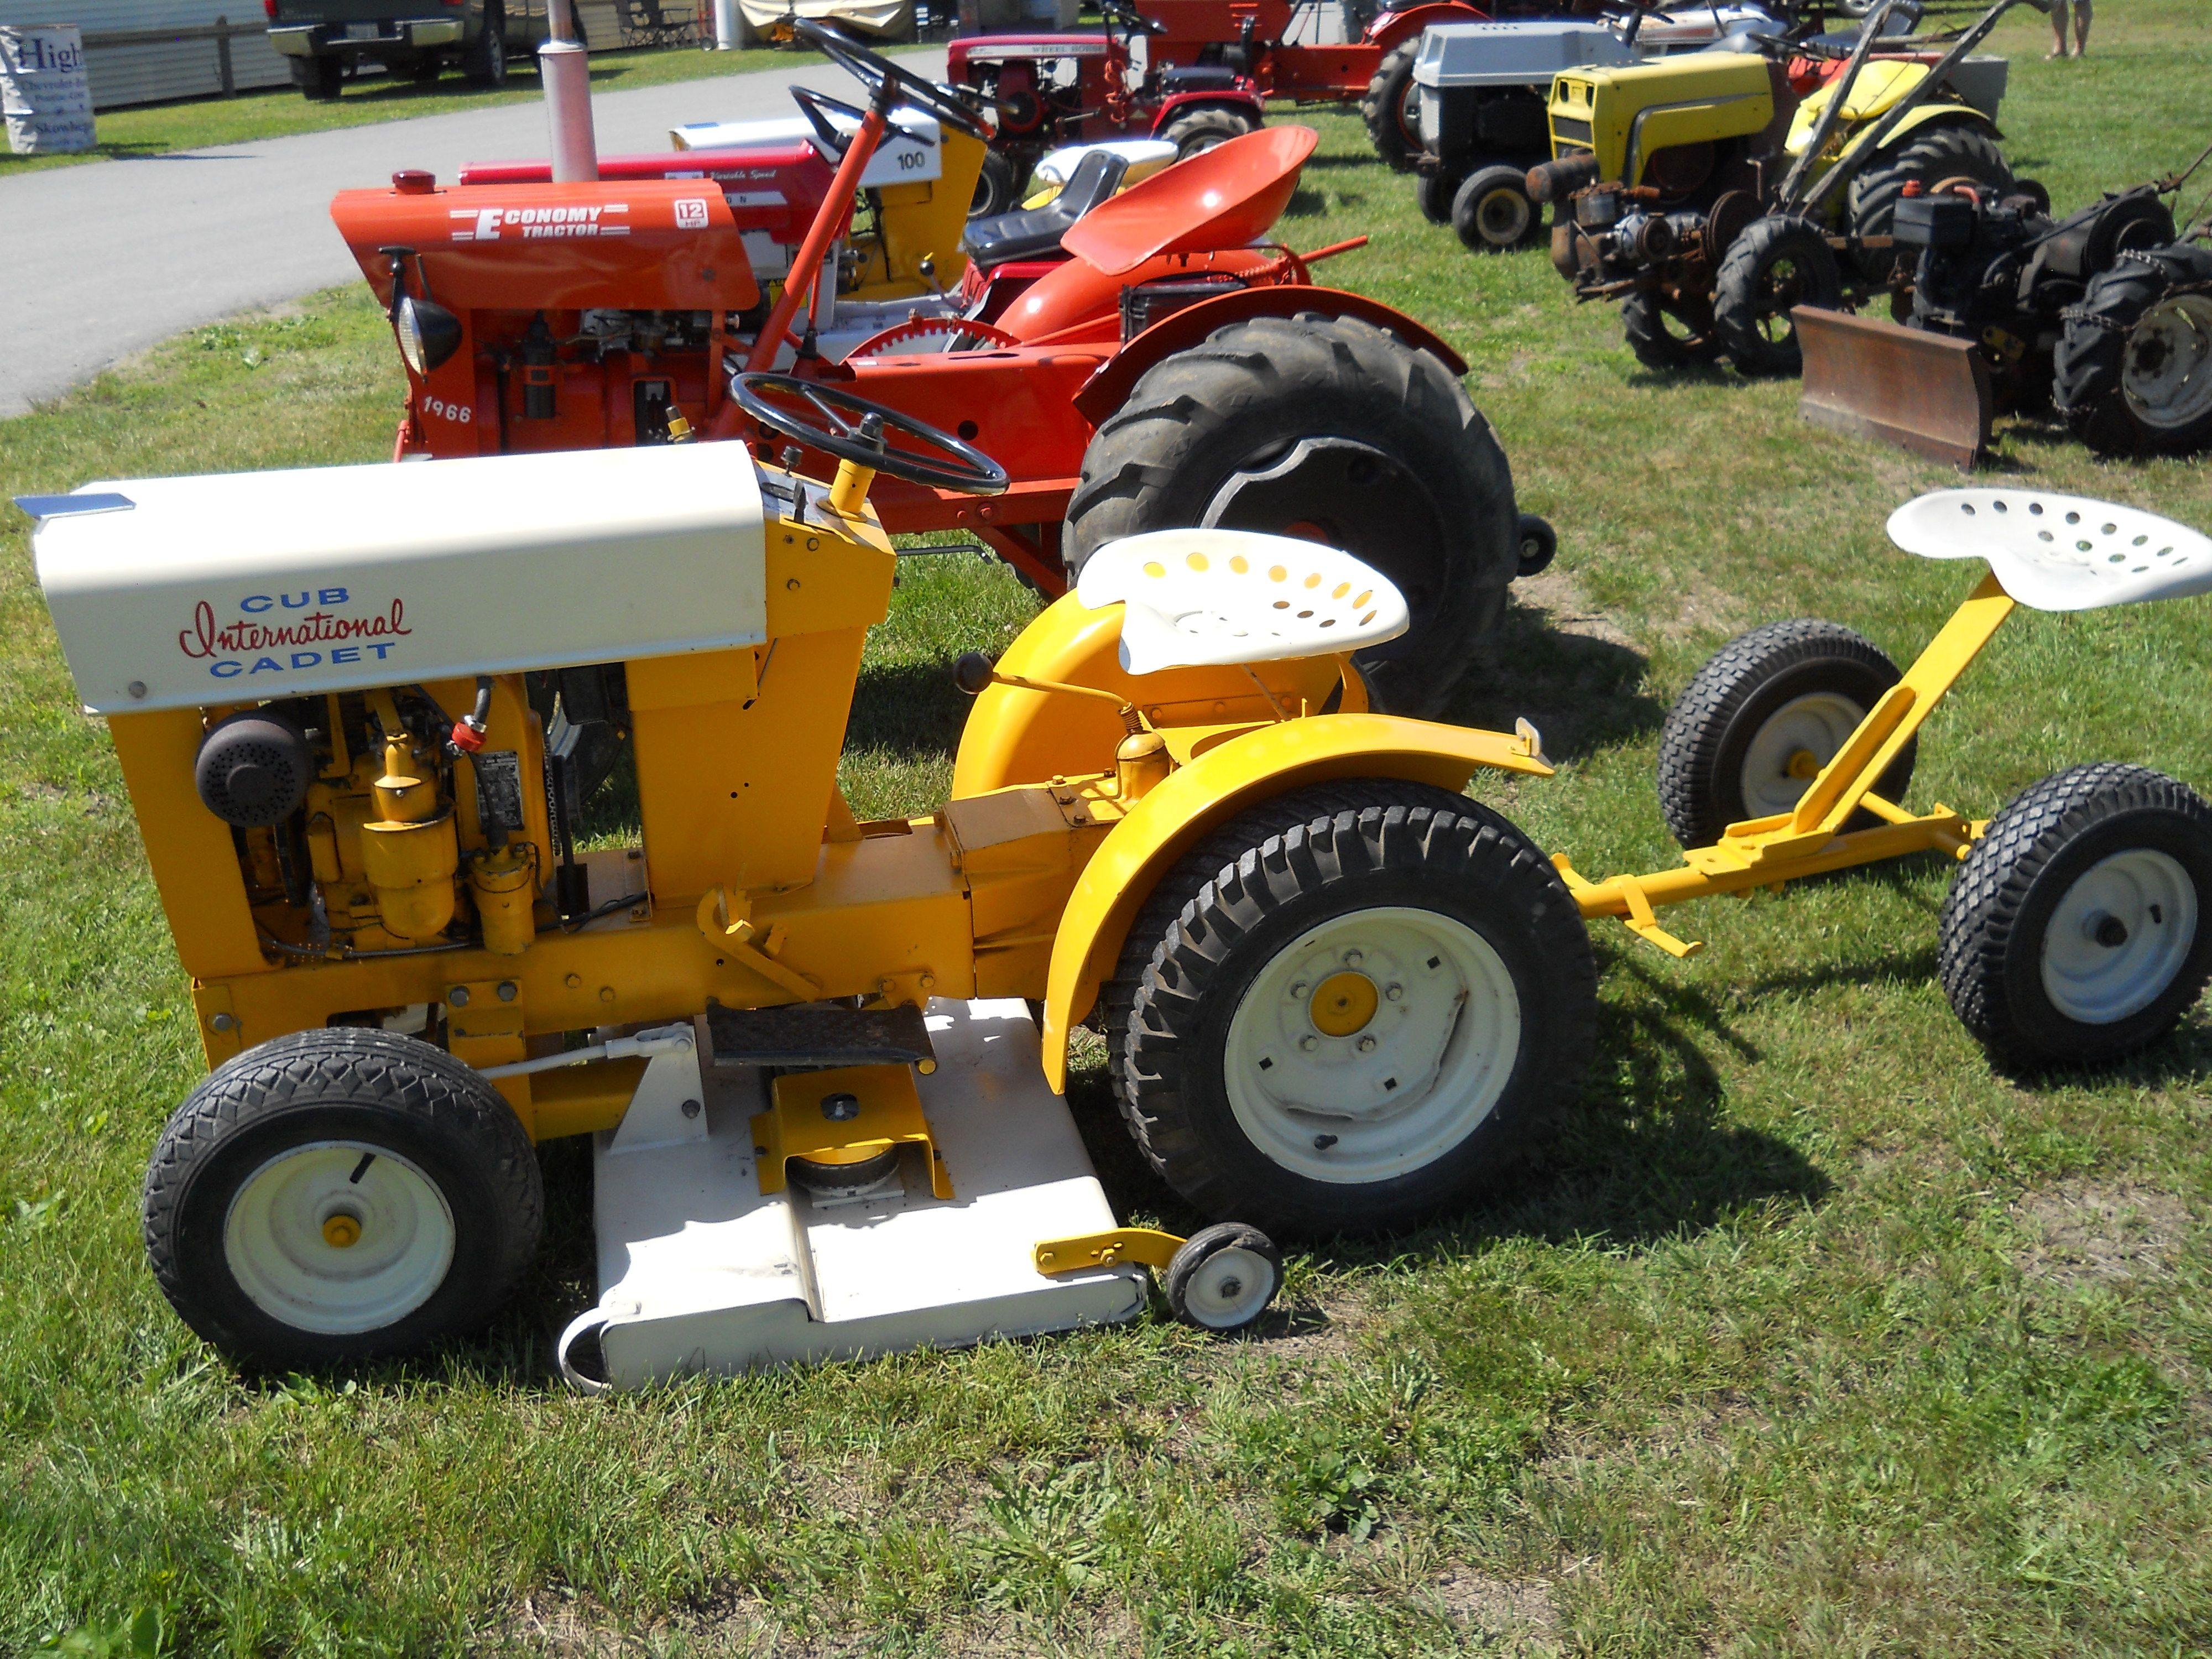 Old Cub Cadet Mowers : Cub international cadet garden tractors pinterest